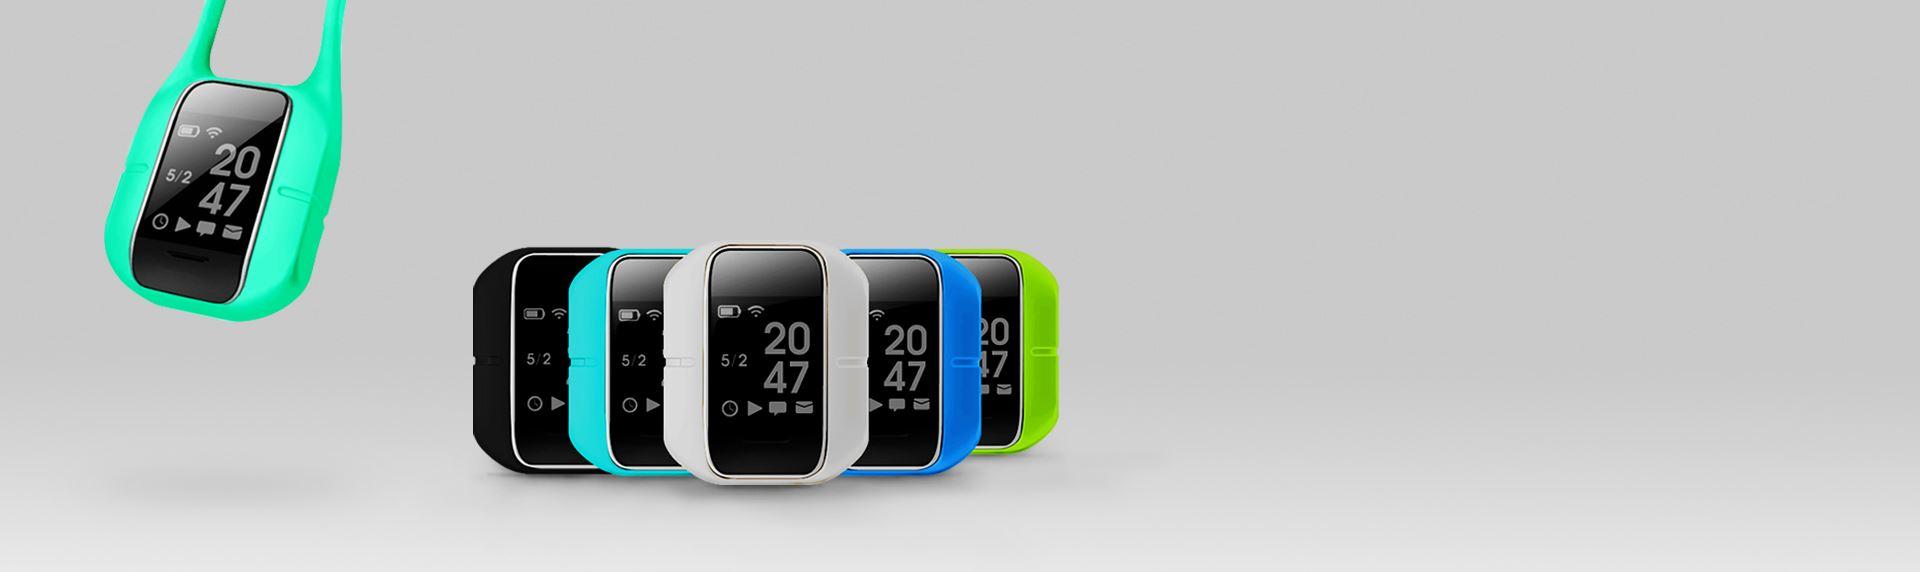 SSC设计-智能手表SmartWatches